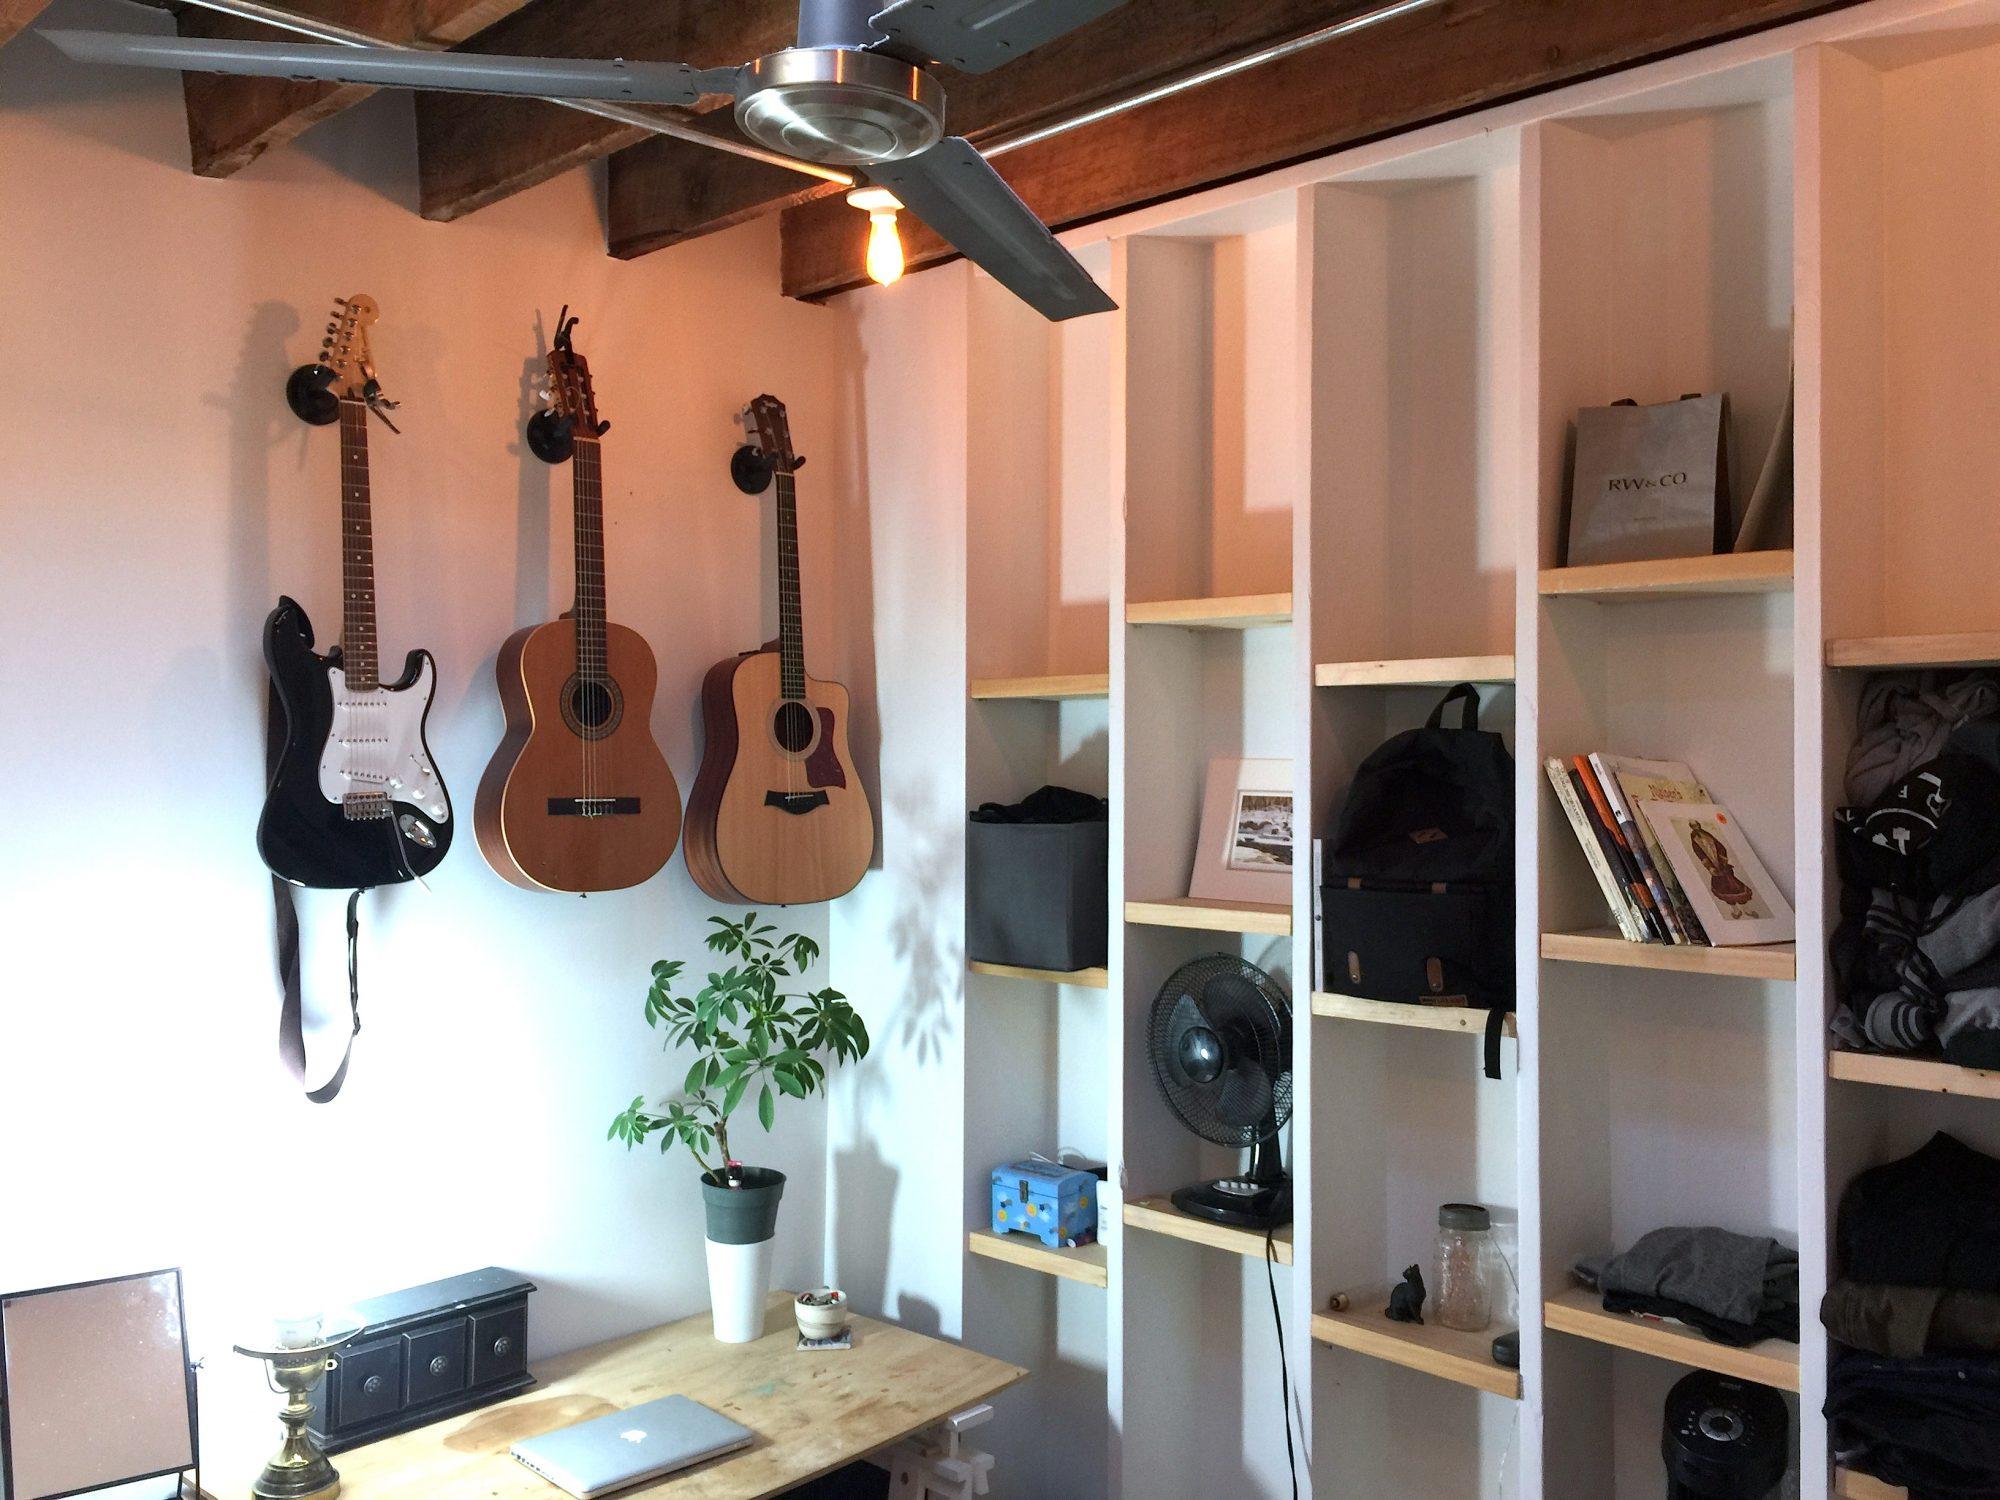 tornoto-apartment-for-rent-917-ossington-avenue-7